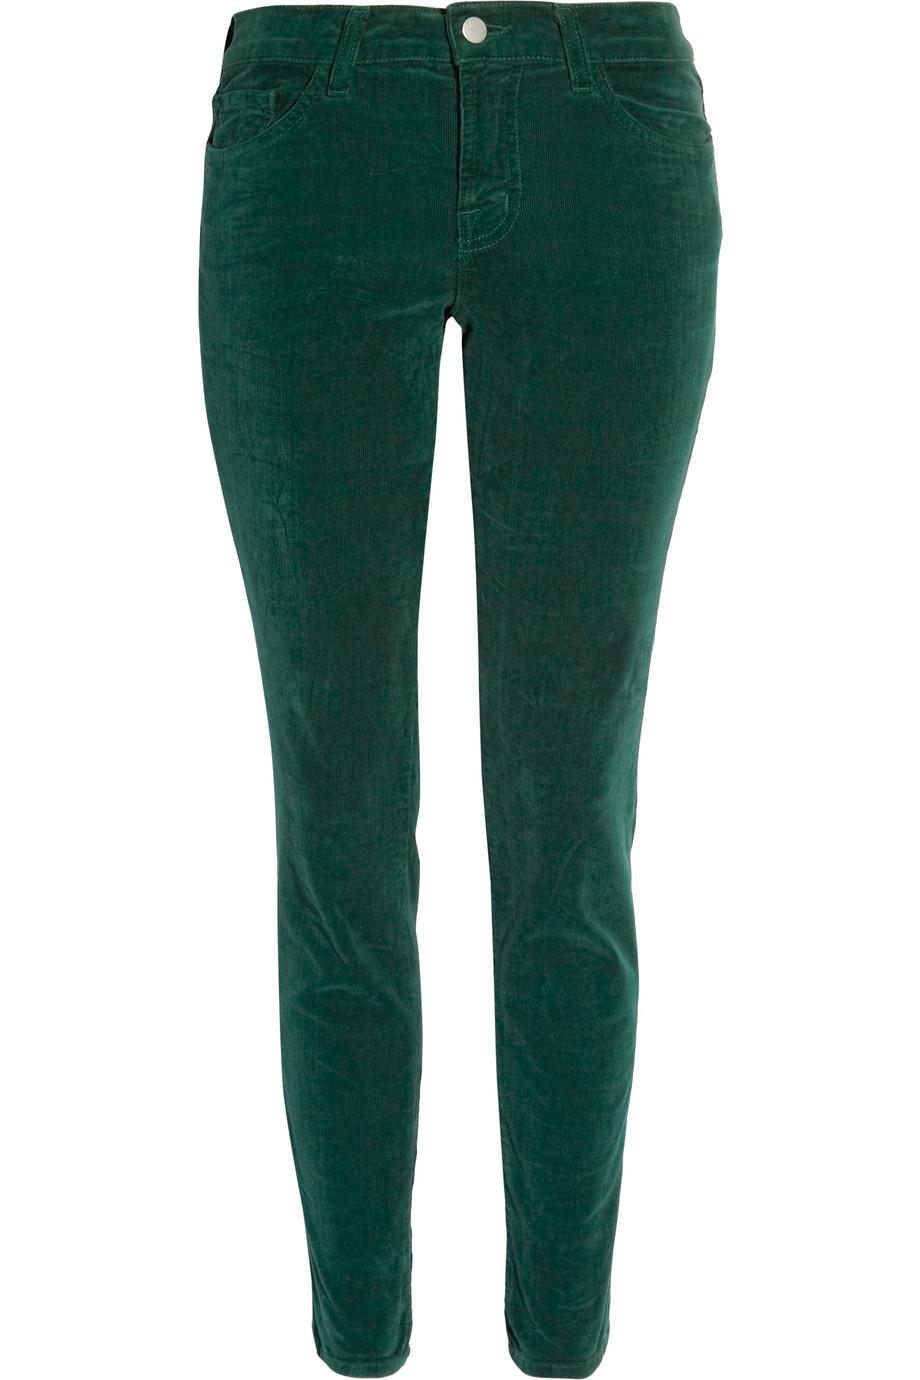 J brand Mid-rise Corduroy Skinny Jeans in Green  Lyst